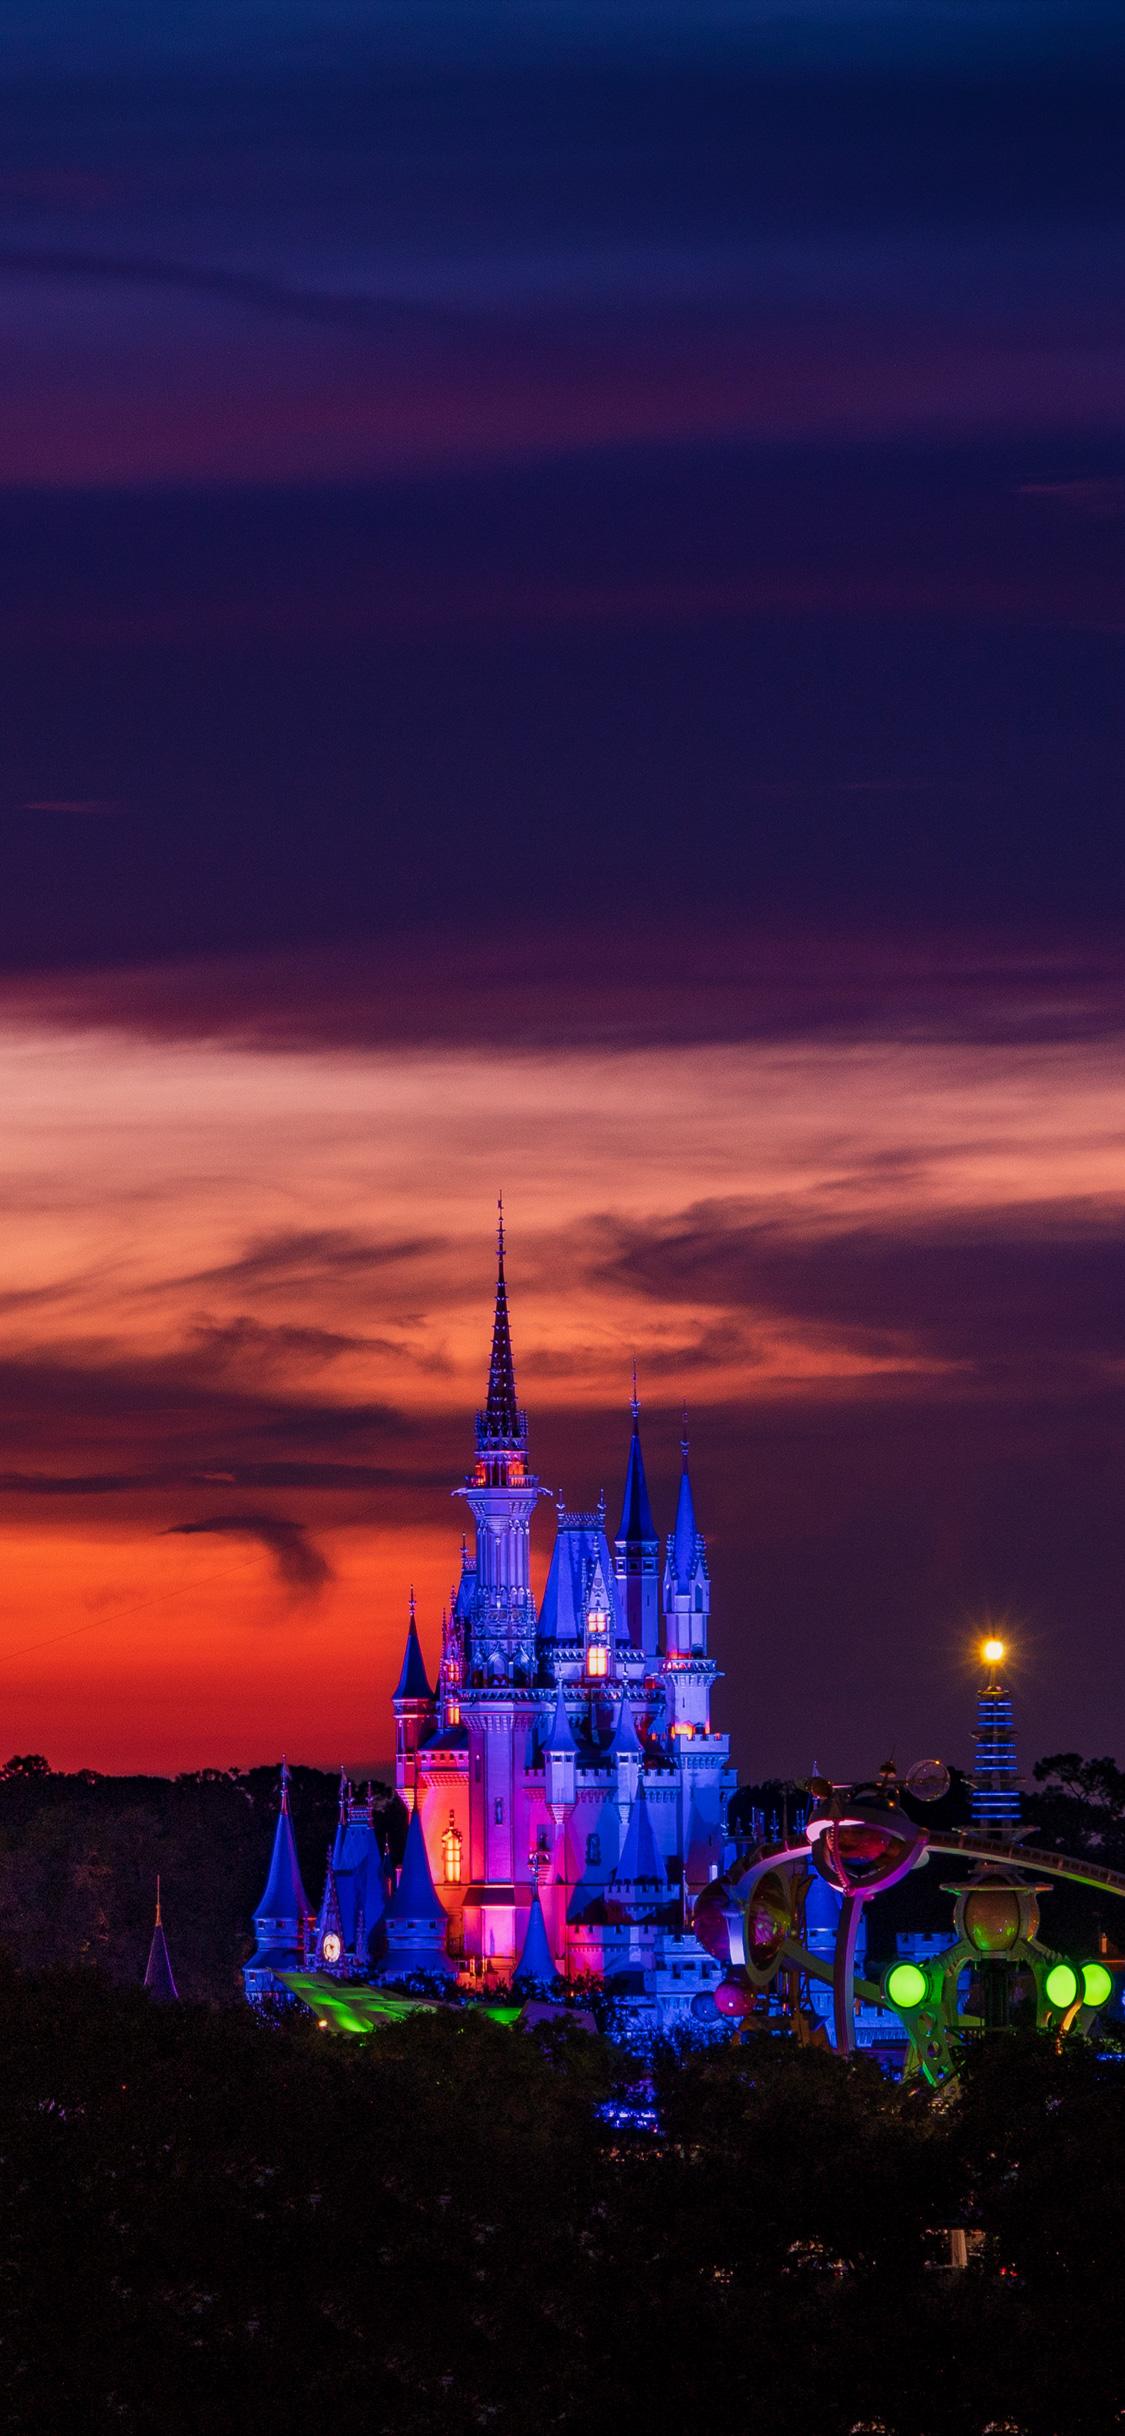 wallpaper dusk sunset cinderella castle magic kingdom disney world 659